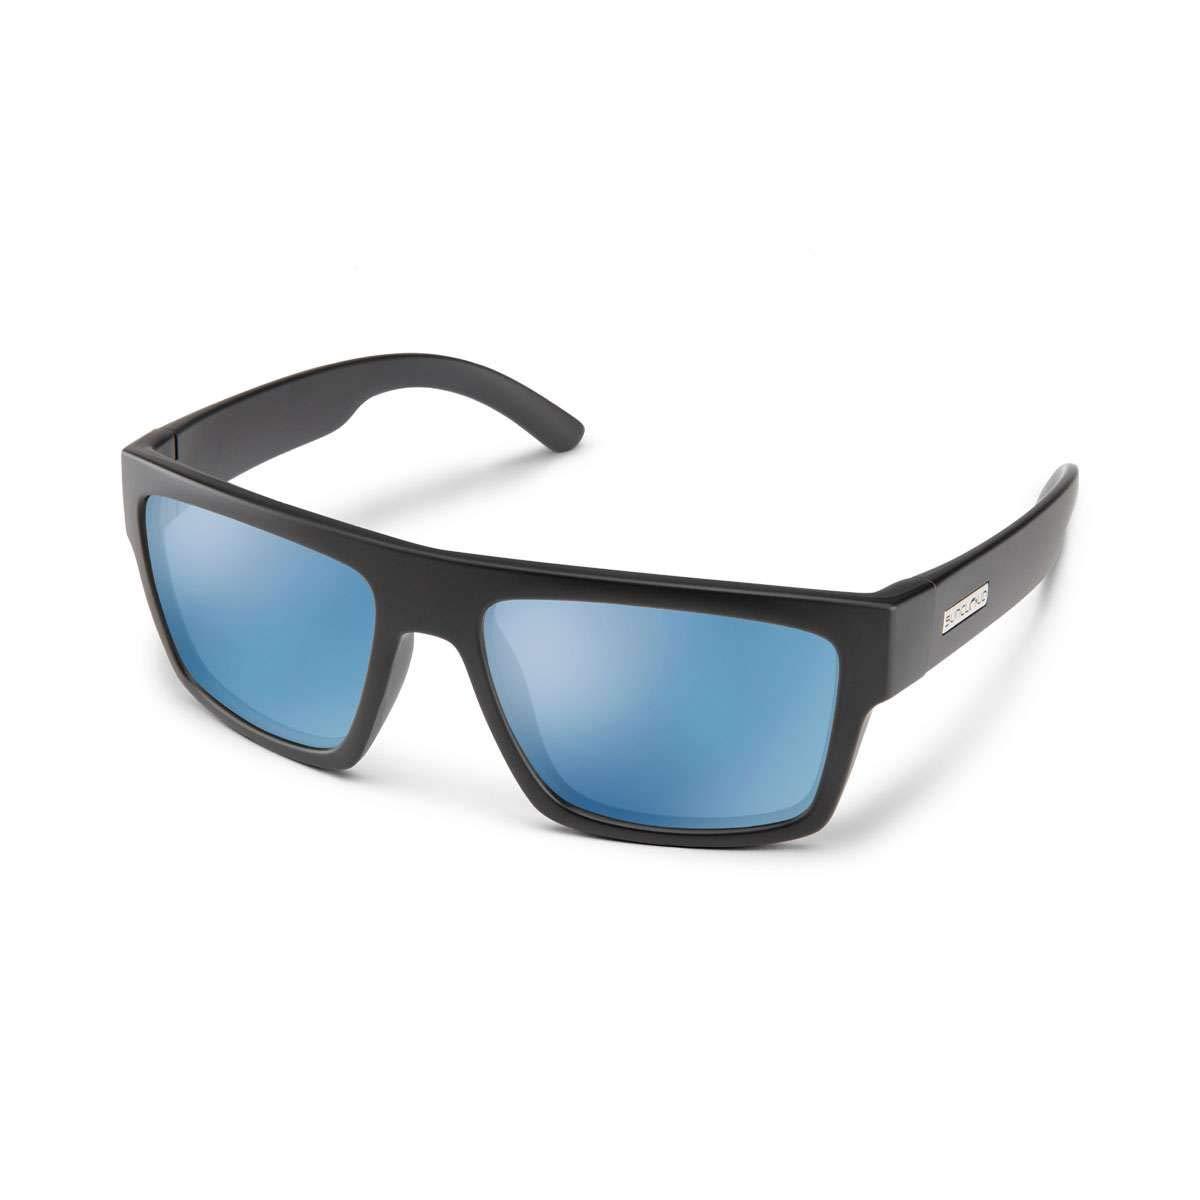 Flatline Polarized Sunglasses